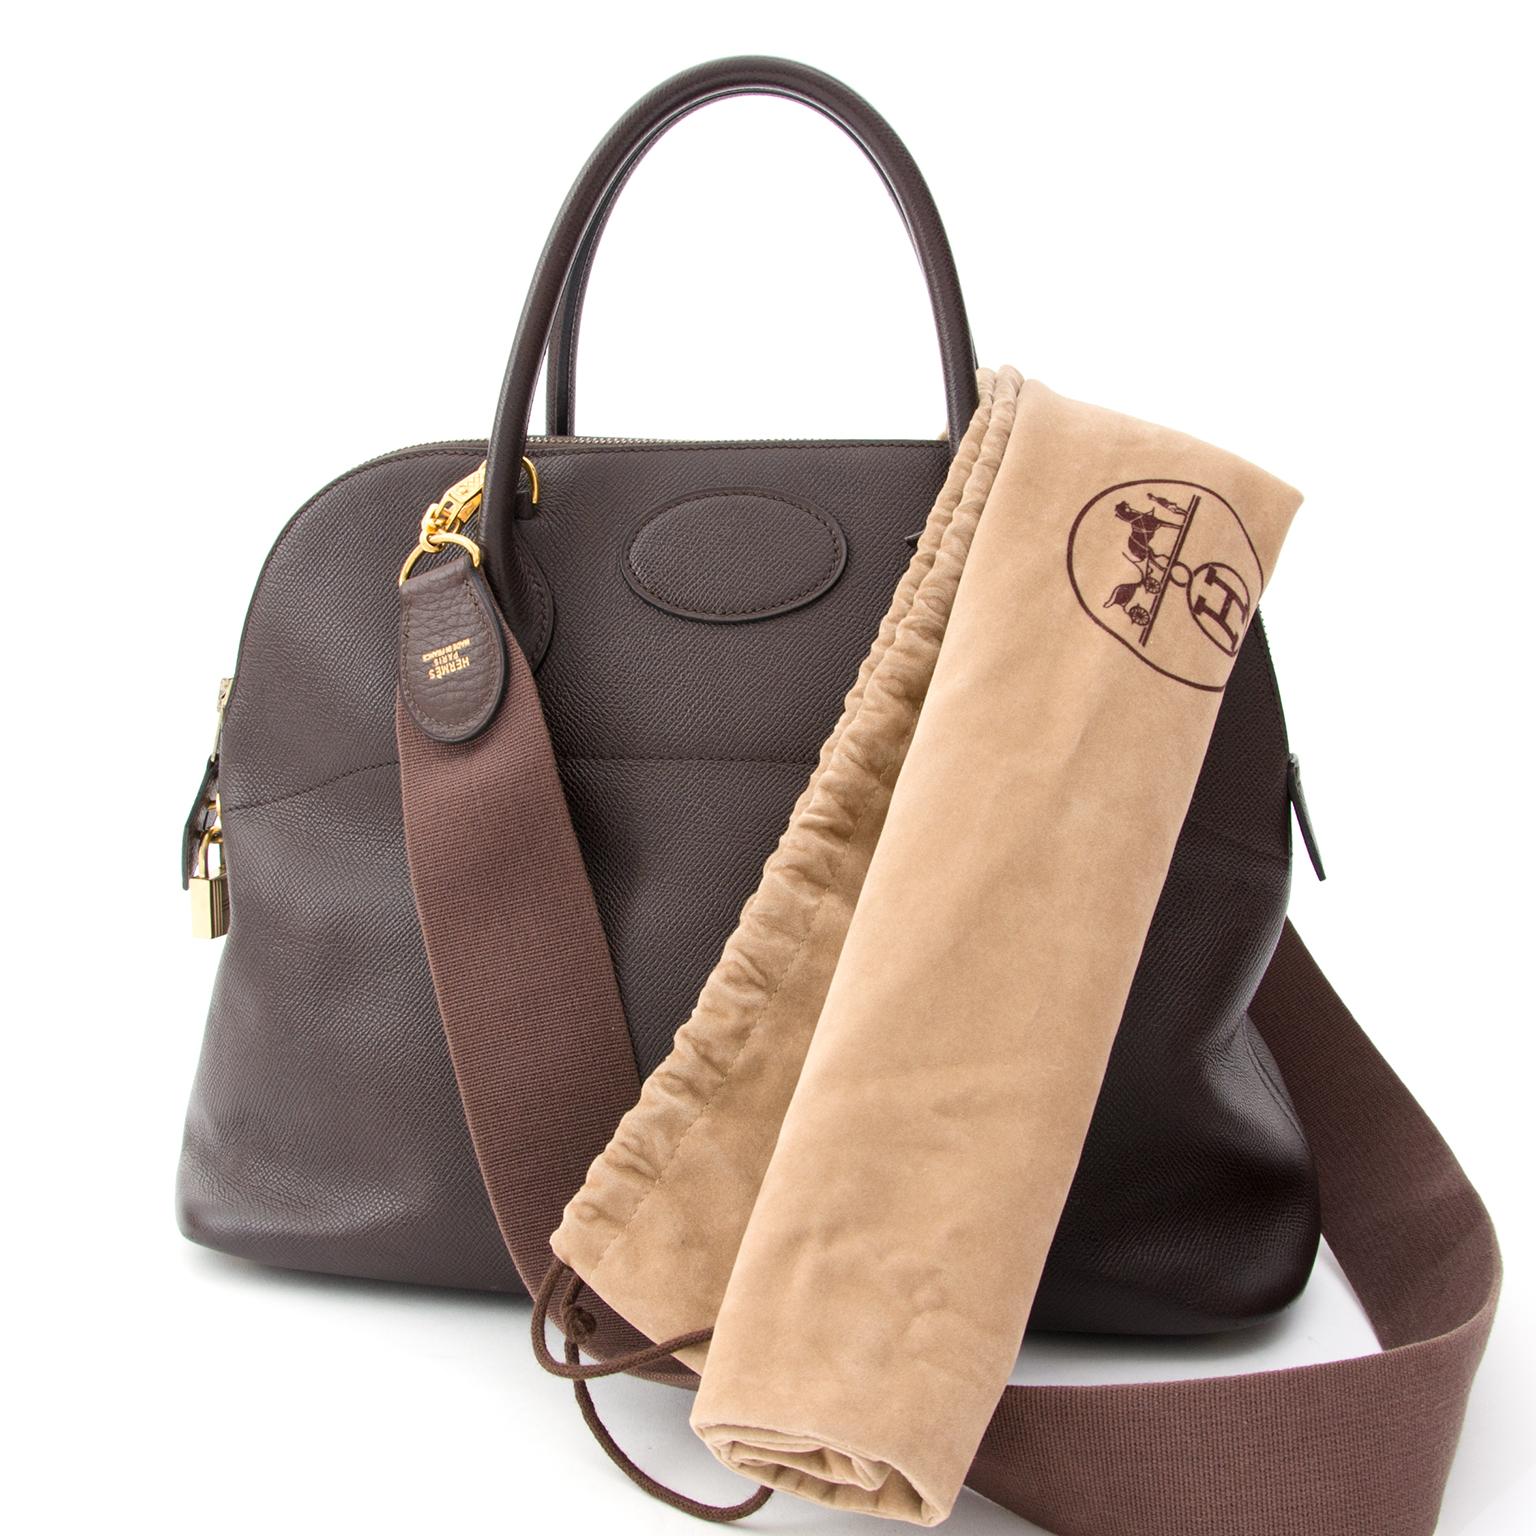 a561b8a1d3b03 ... Hermès Bolide 35 Cafe Brown Courchevel Authentieke tweedehands handtas  beste prijs online winkelen LabelLOV webshop luxe